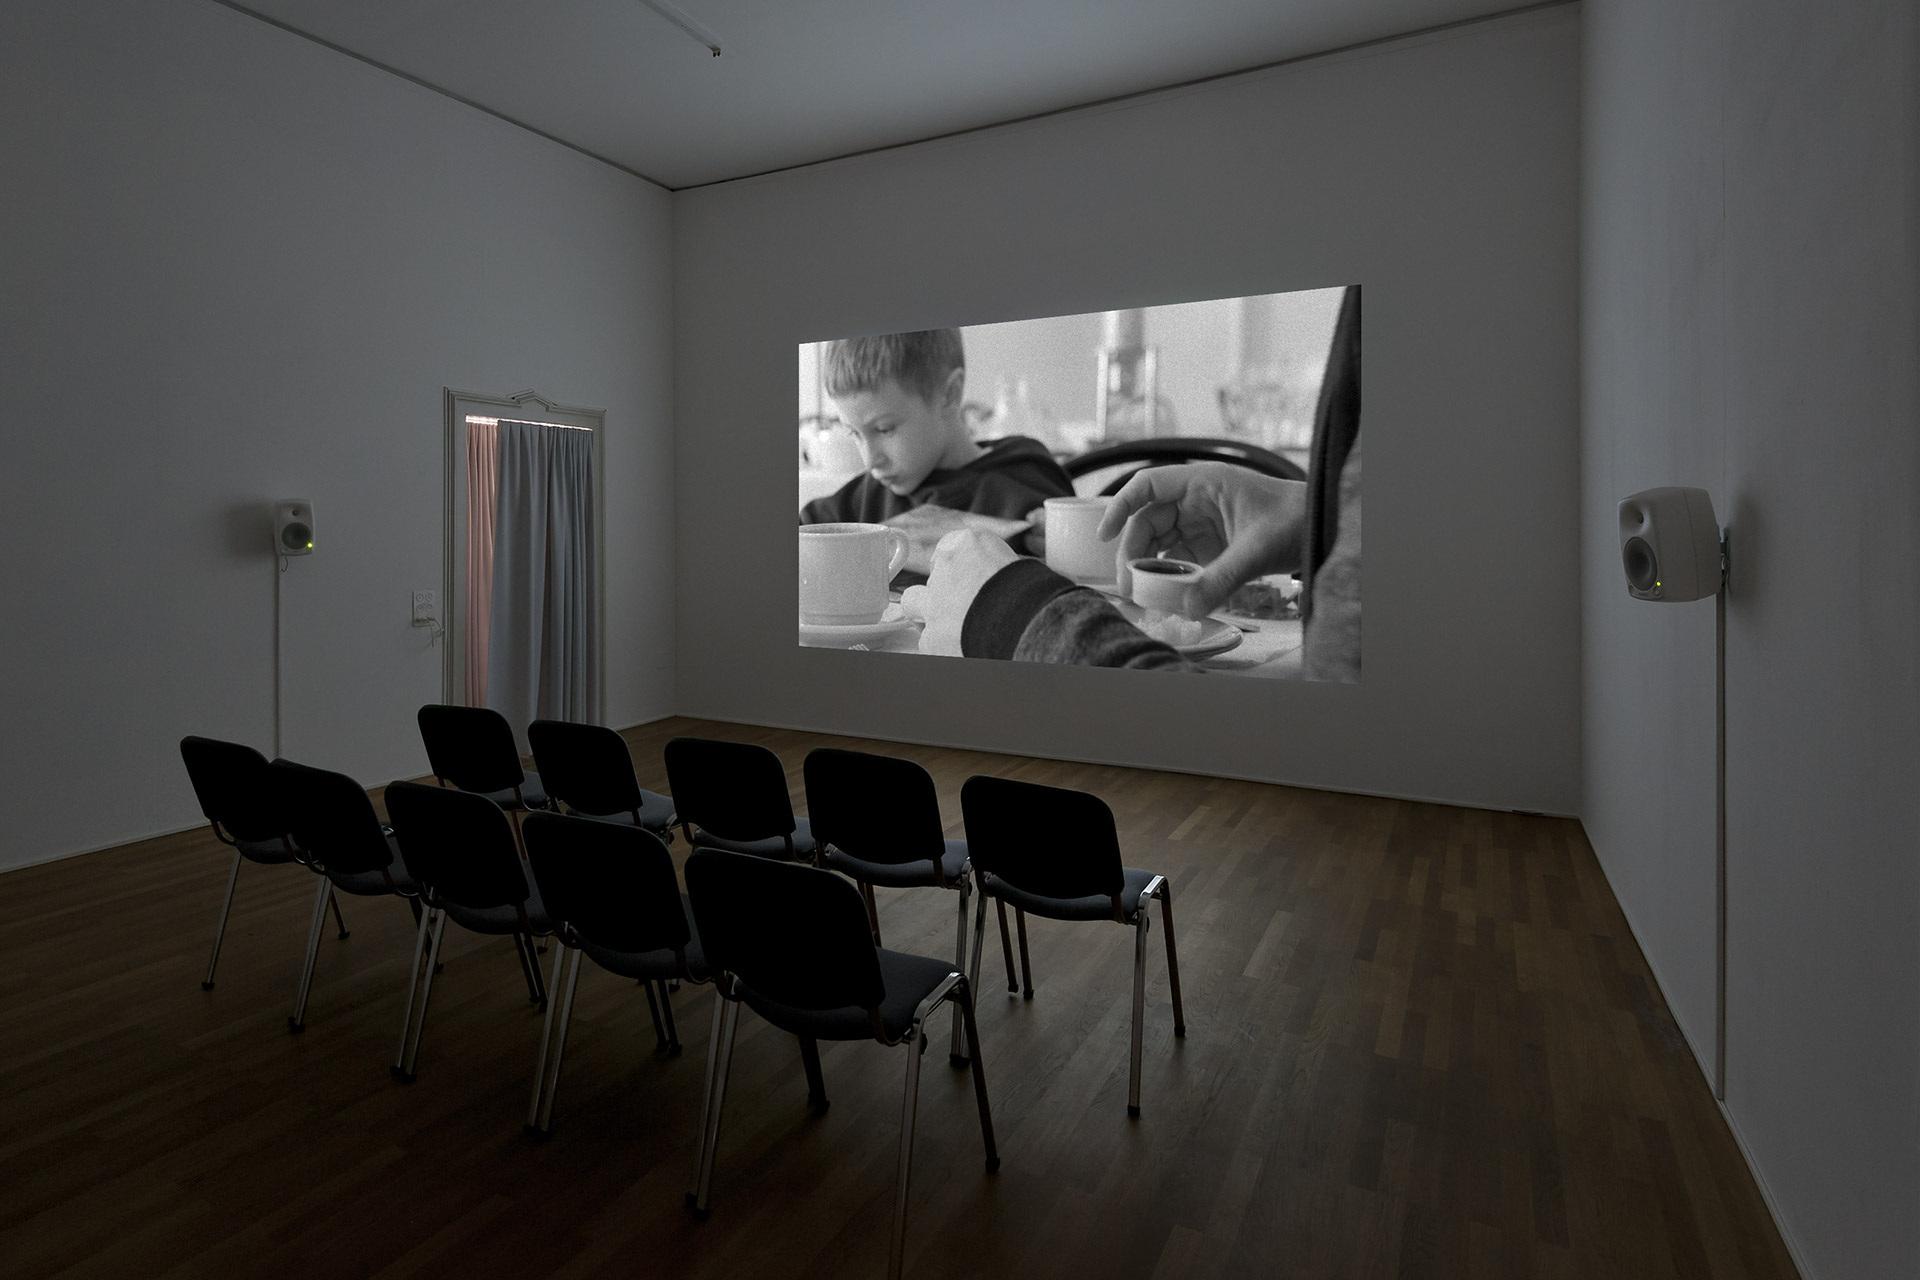 Josef-Dabernig-Kunsthalle-Winterthur-2016.jpg